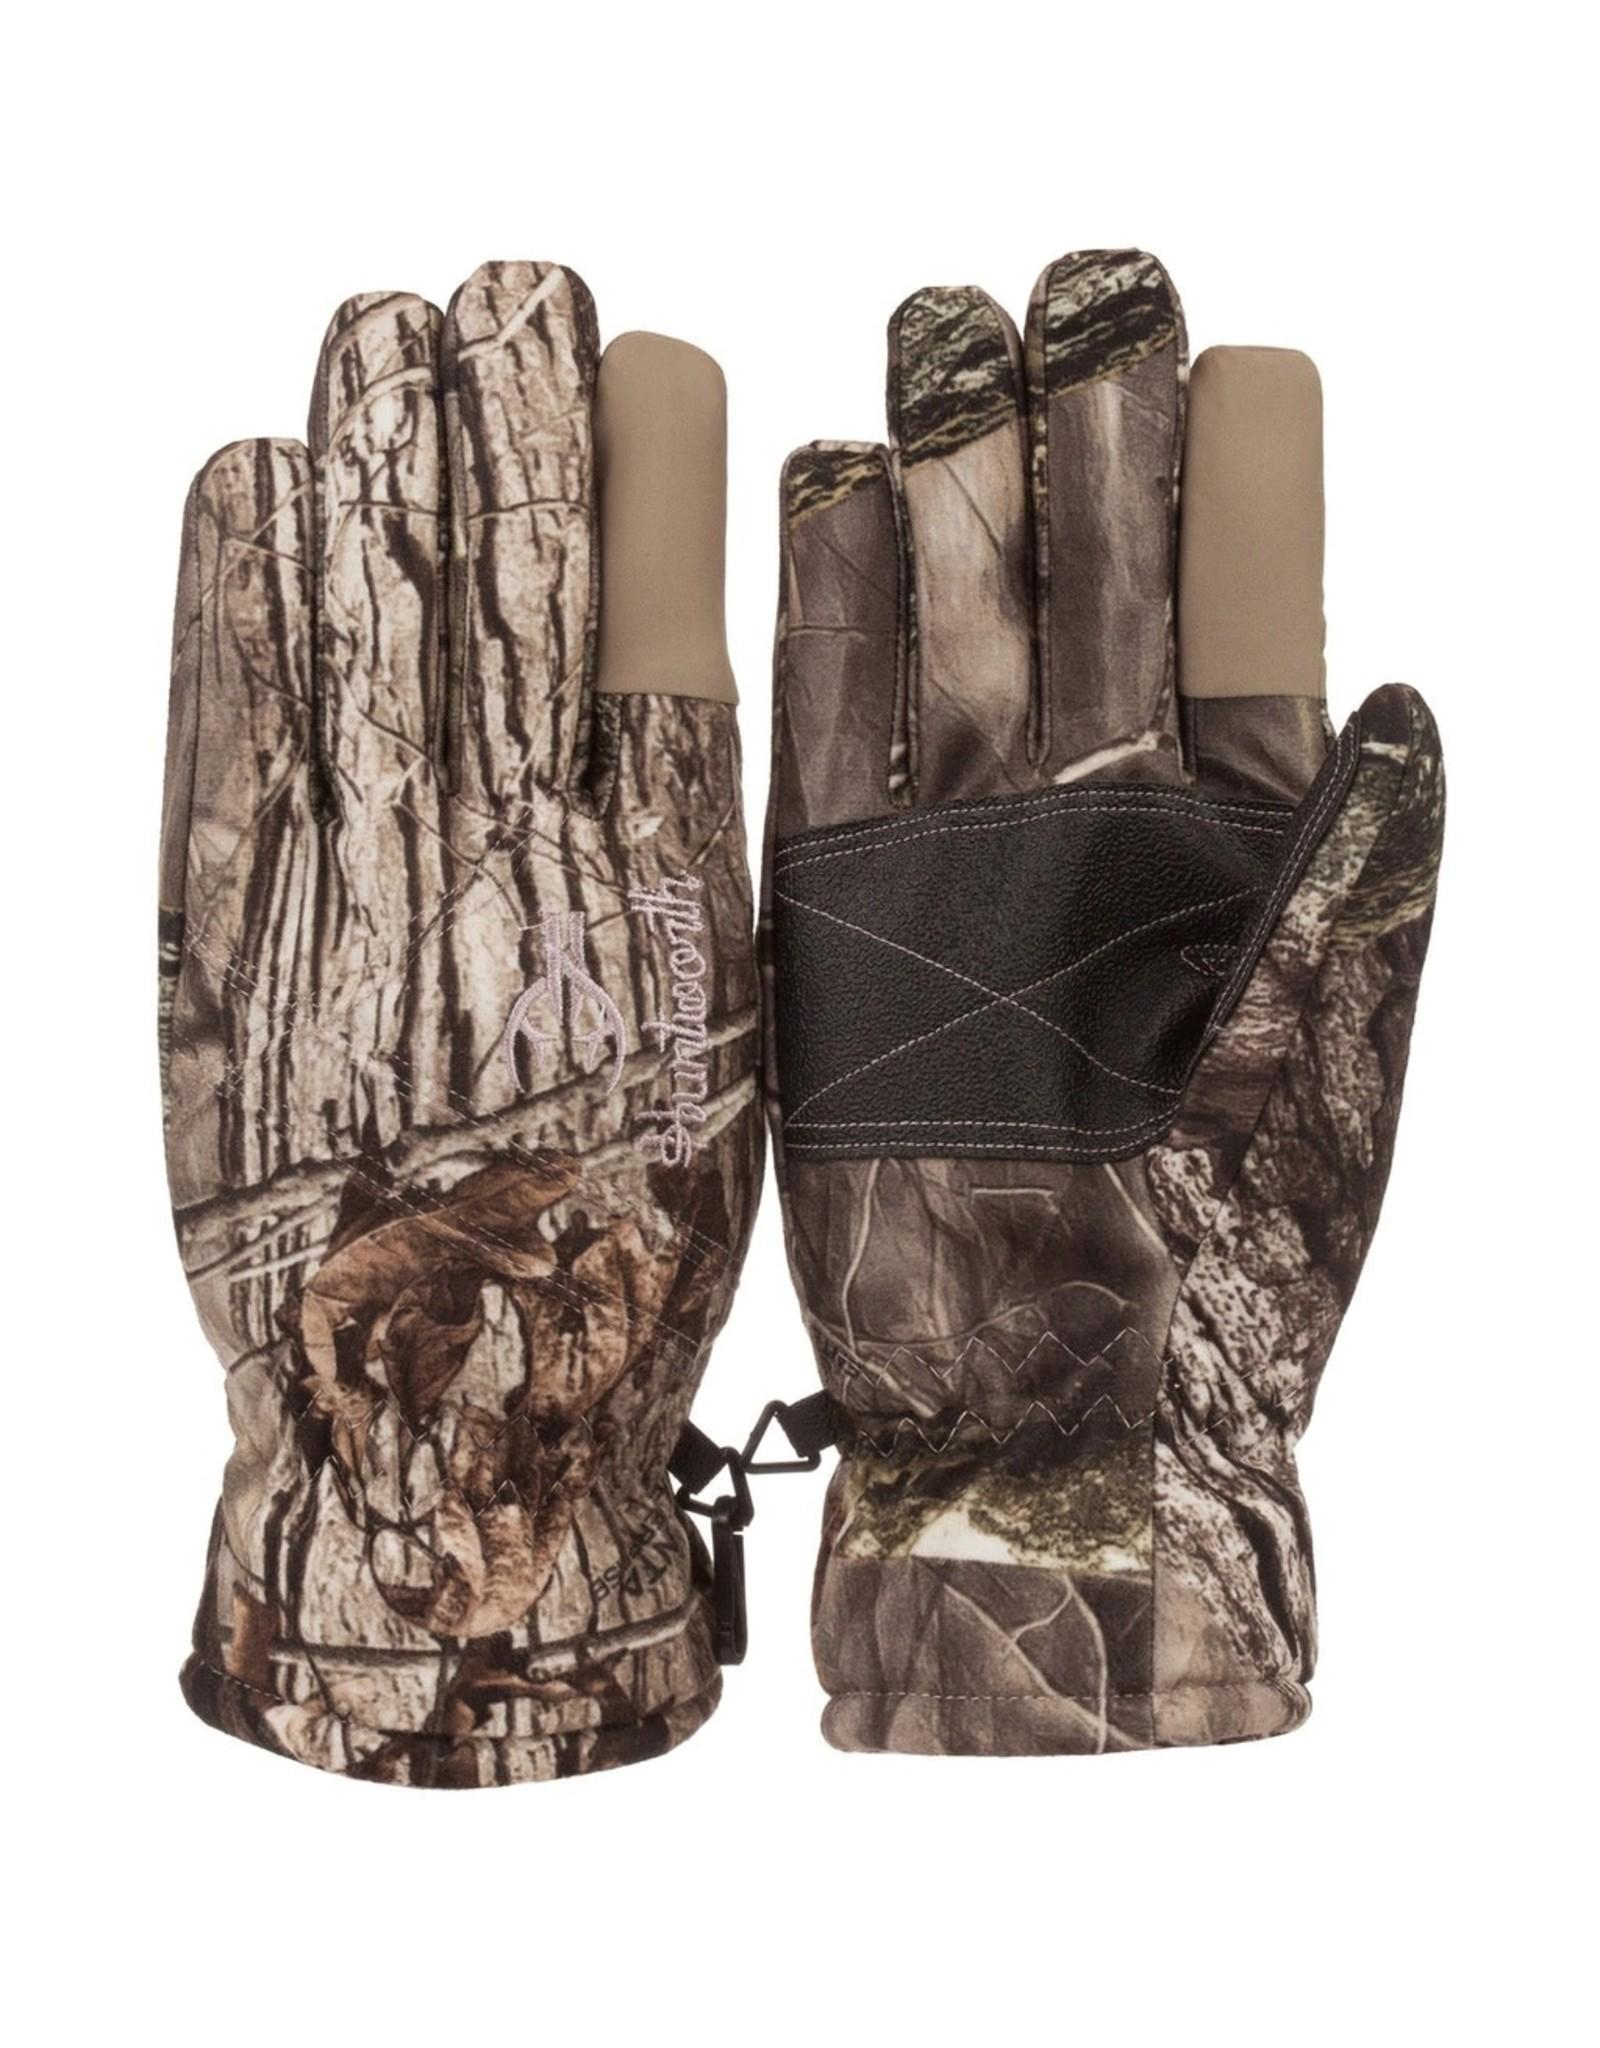 Huntworth Ladies Hunting Gloves